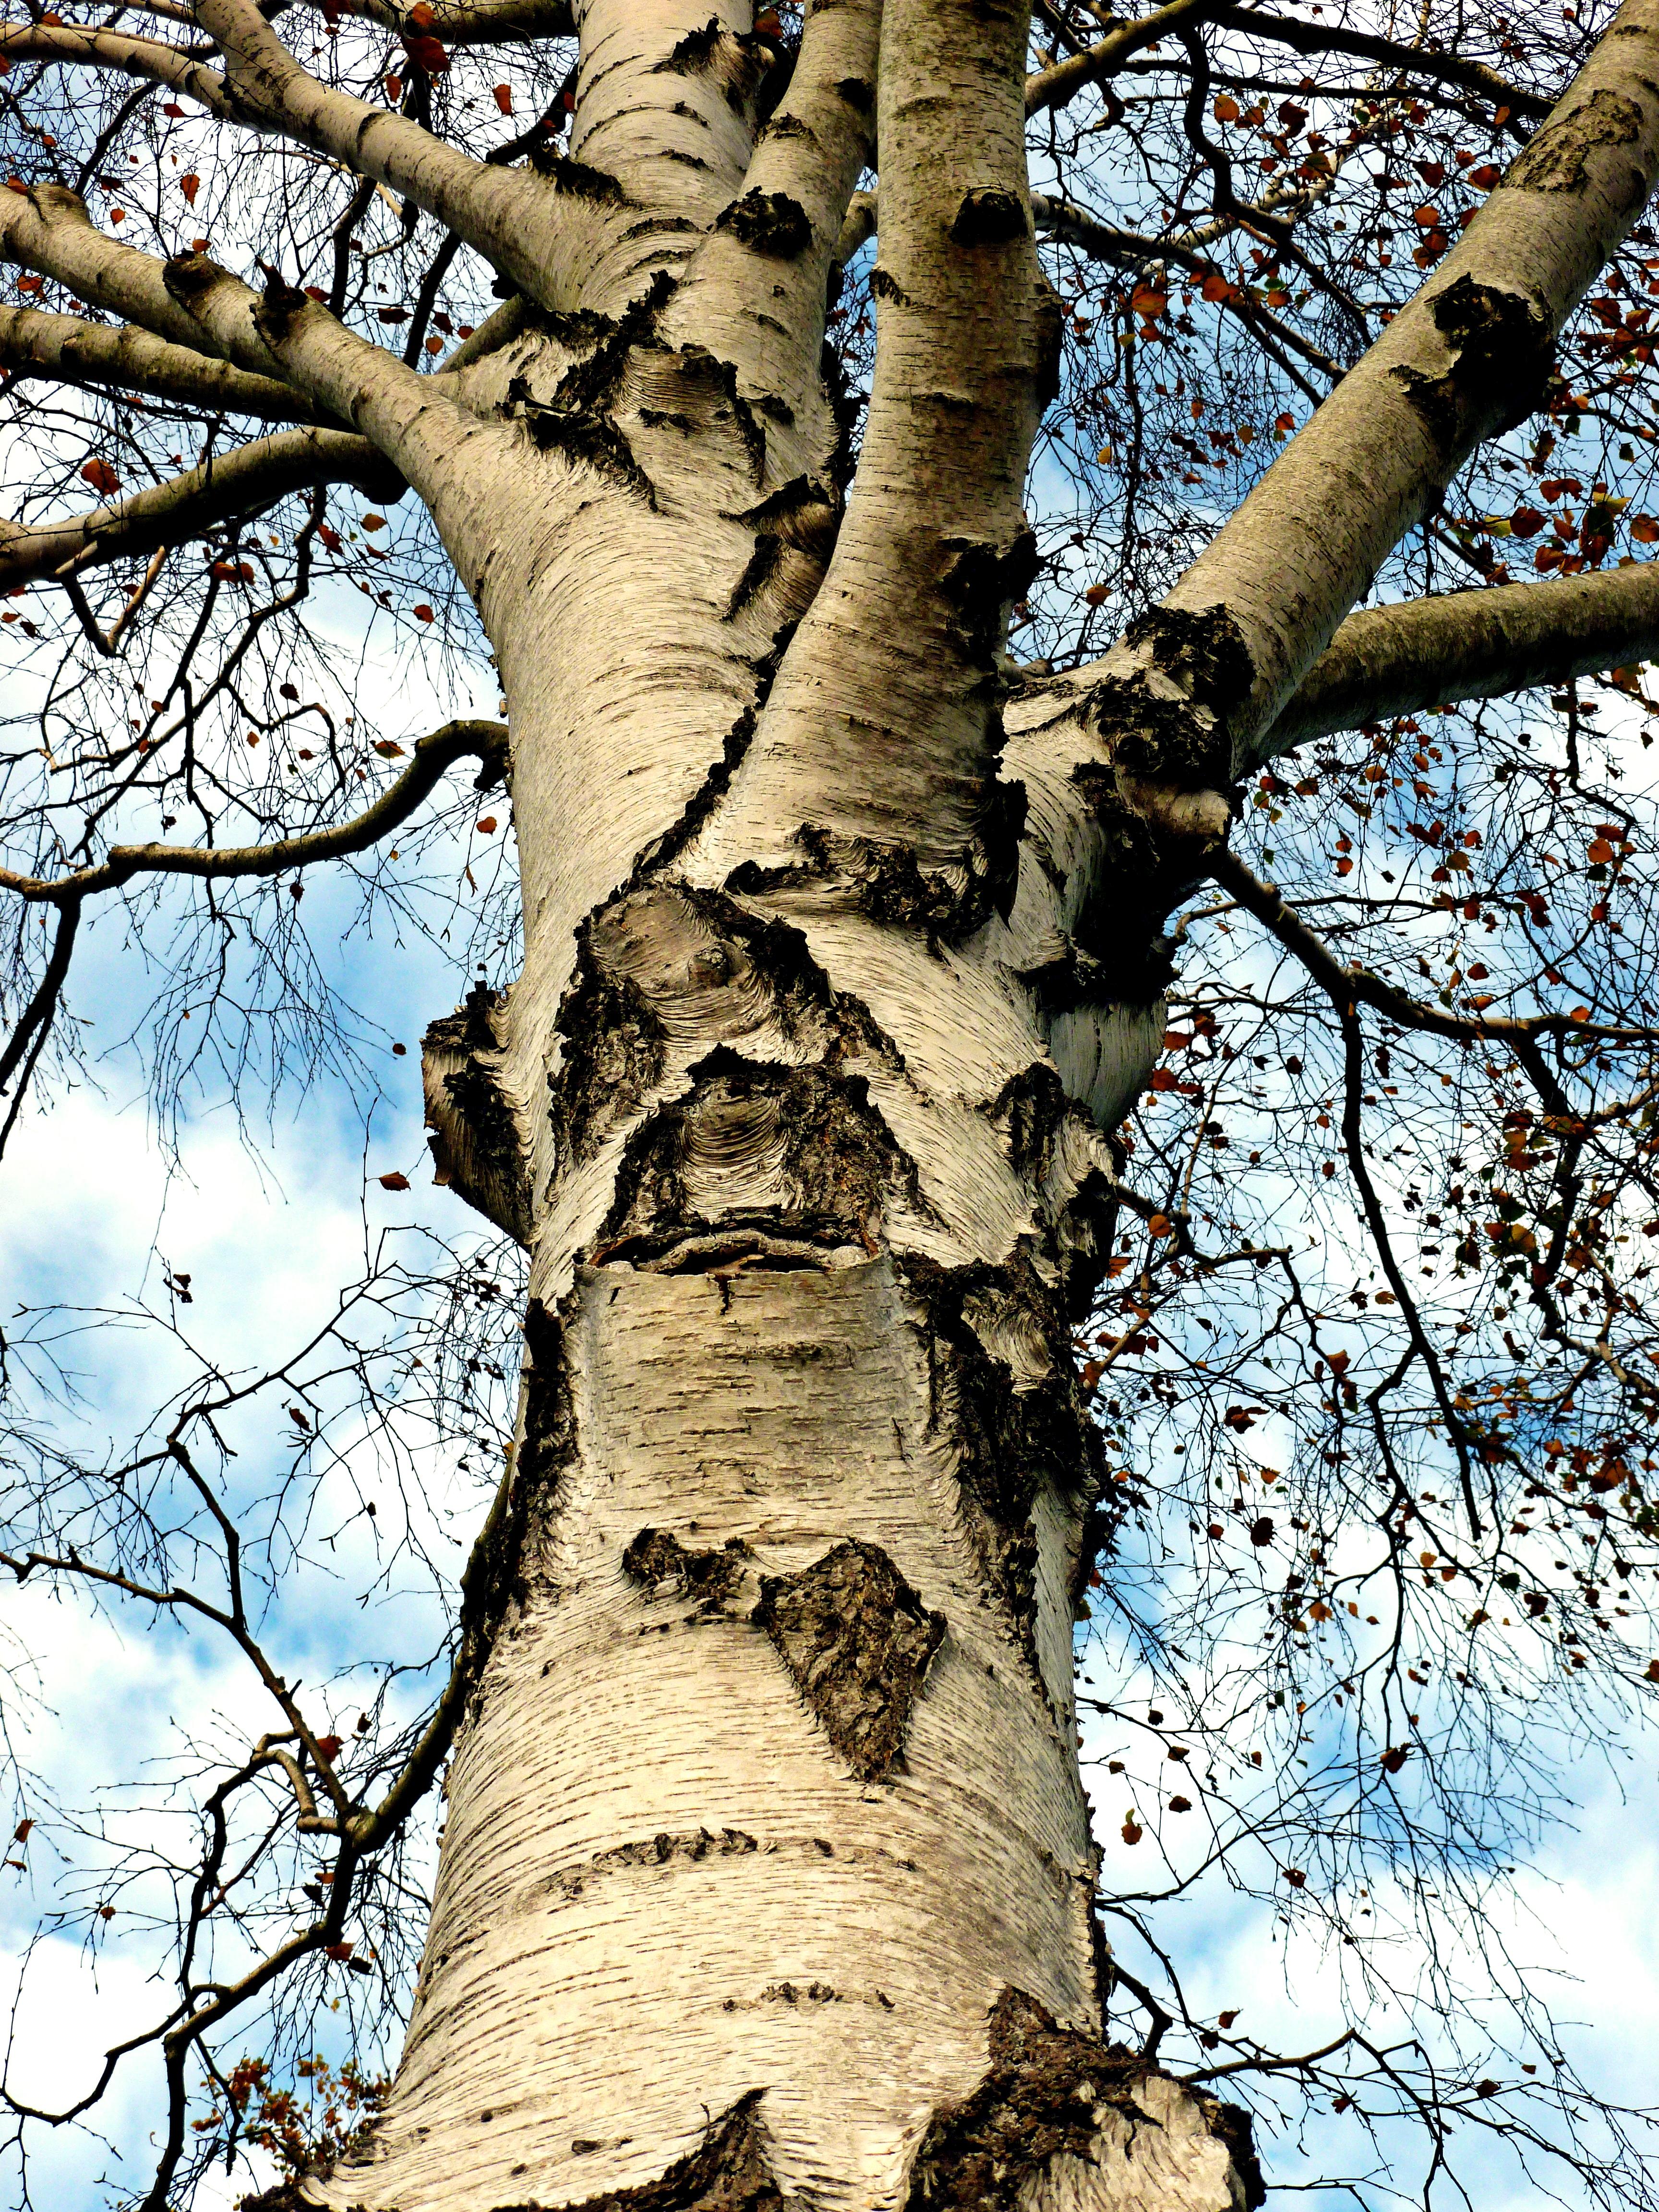 Fotos gratis : naturaleza, rama, madera, flor, el maletero, ladrar ...